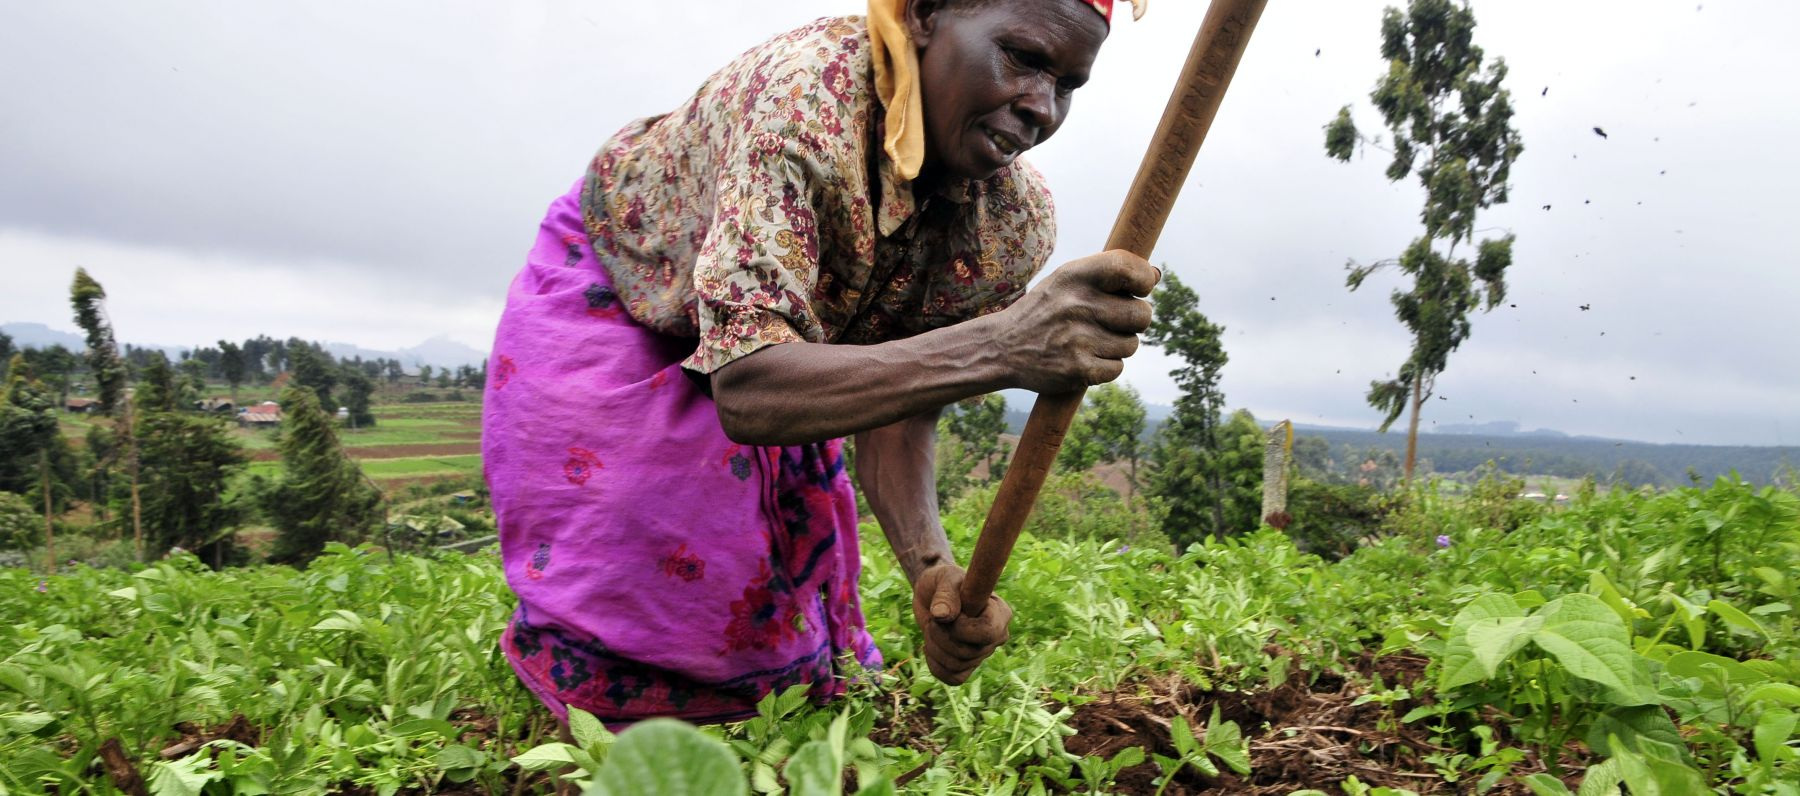 A woman tends to her crop in Kenya.